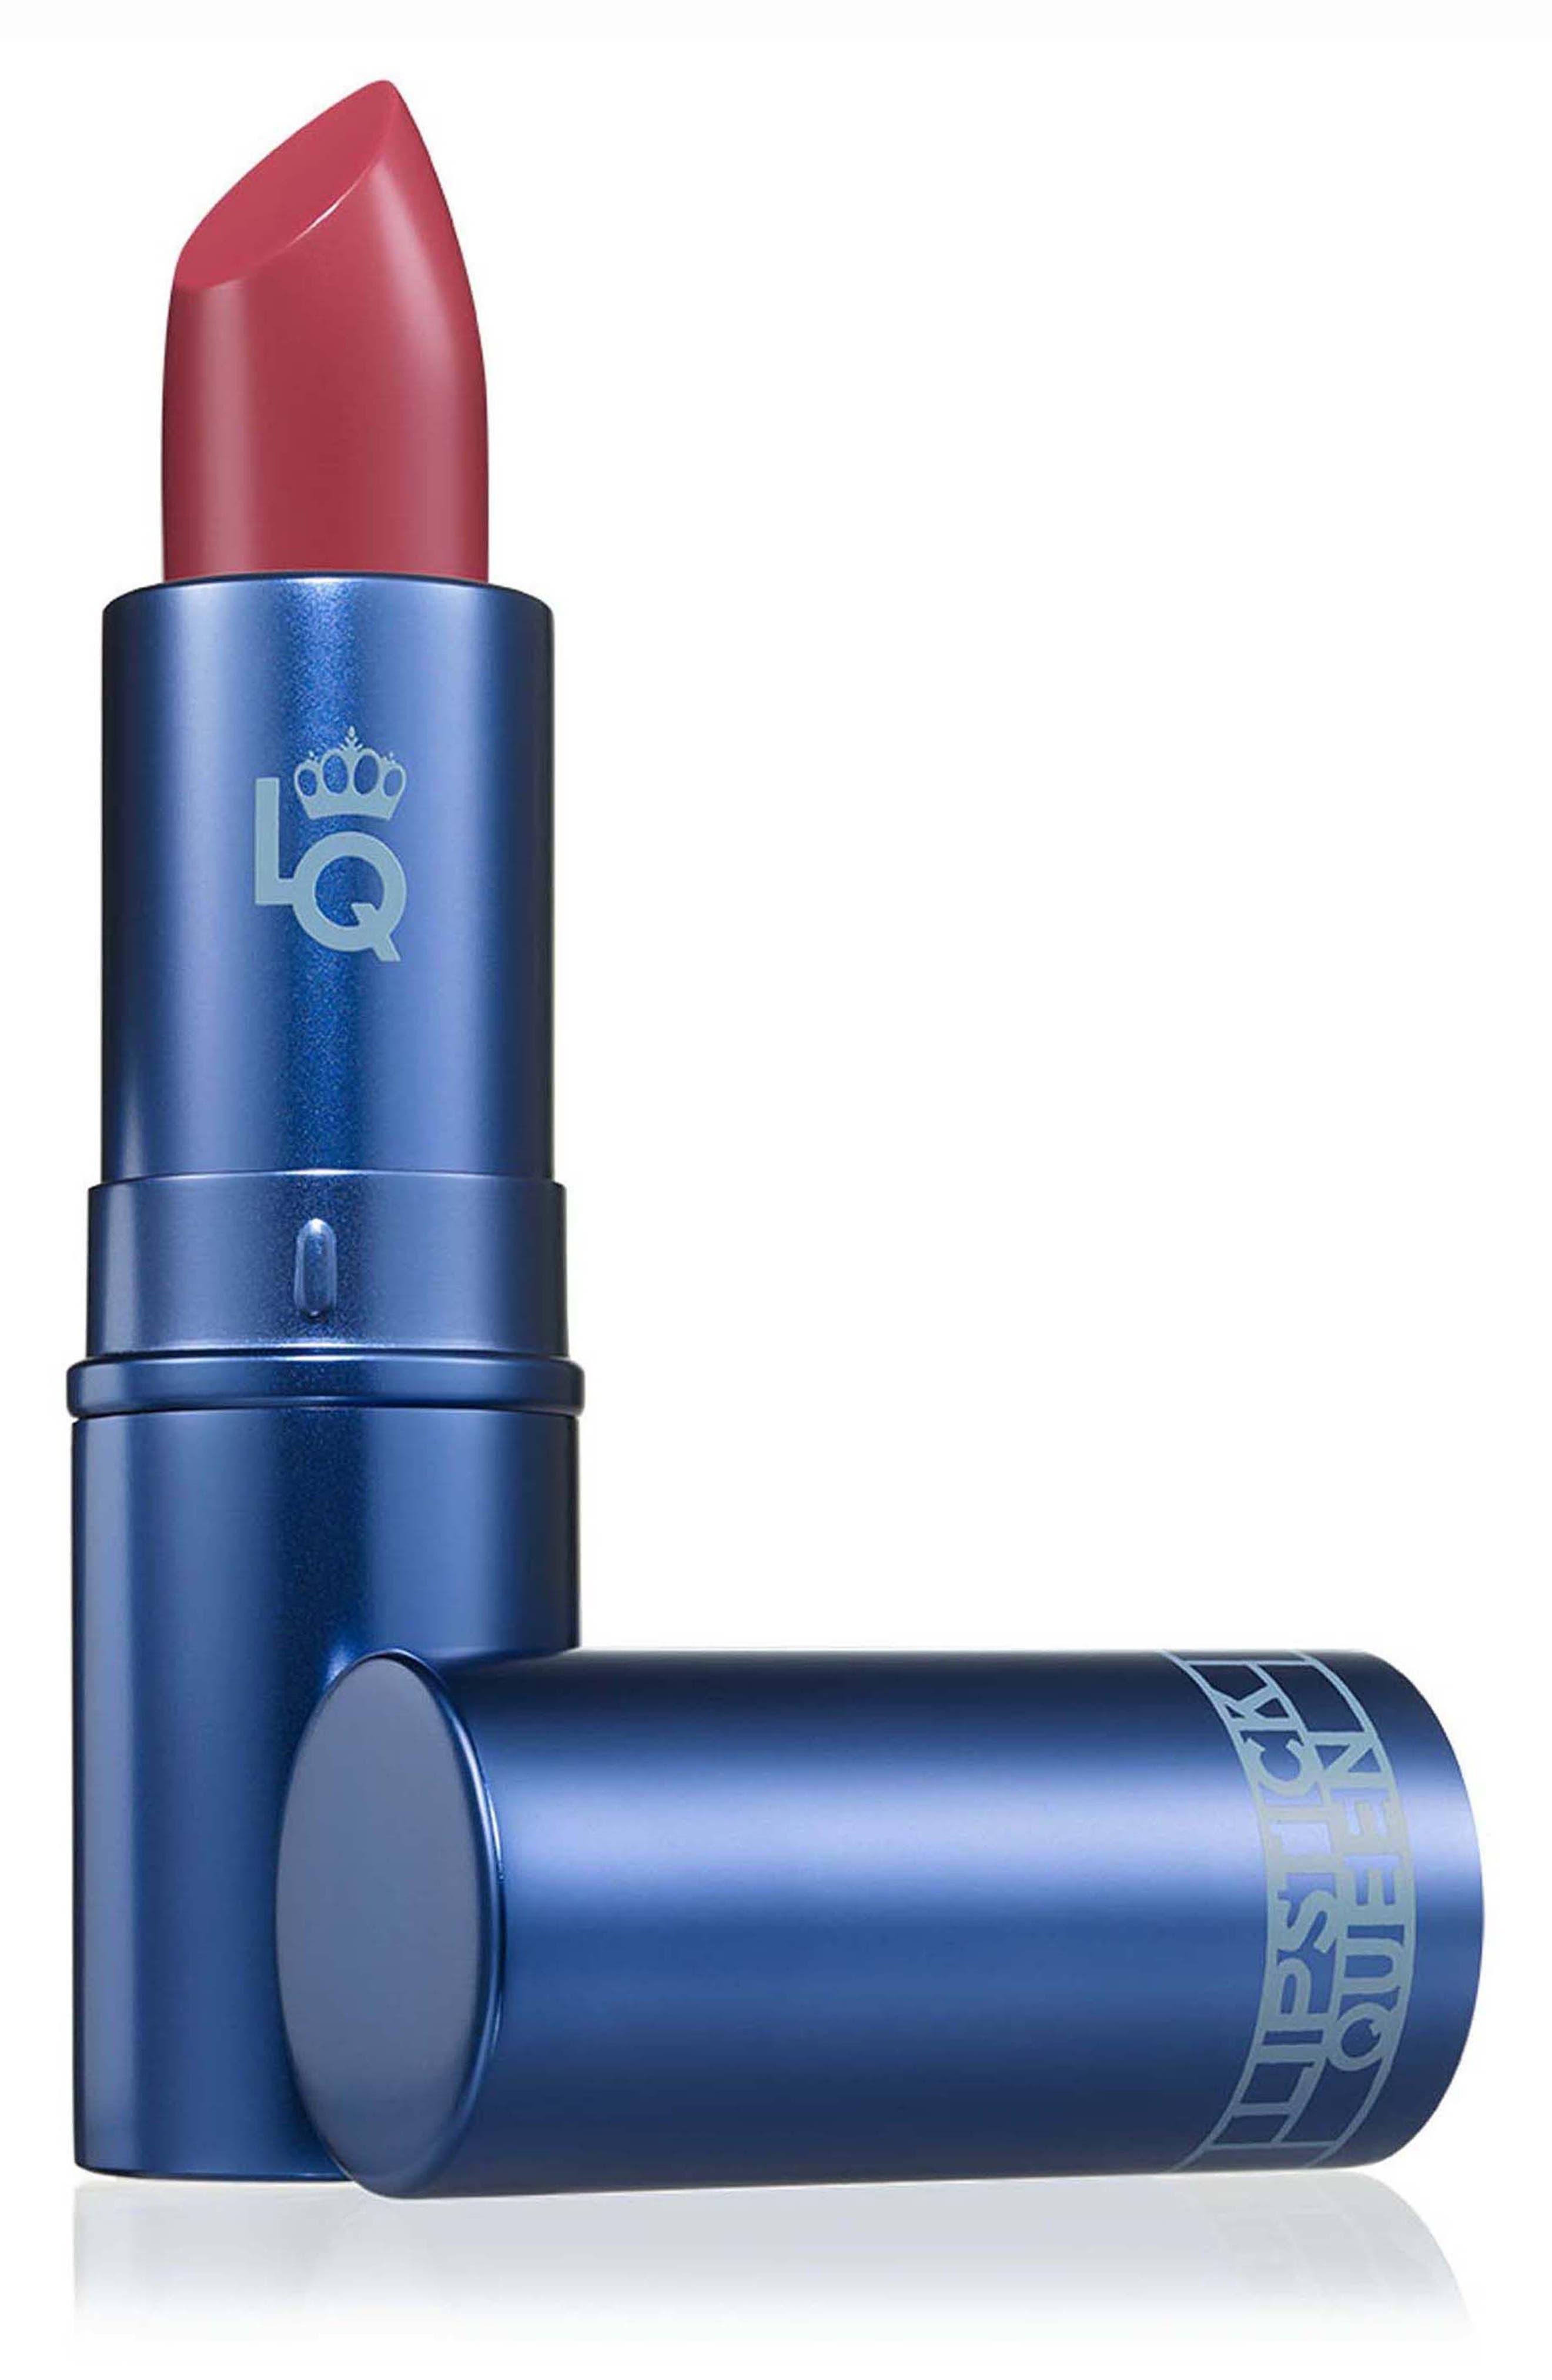 Alternate Image 1 Selected - SPACE.NK.apothecary Lipstick Queen Jean Queen Lipstick